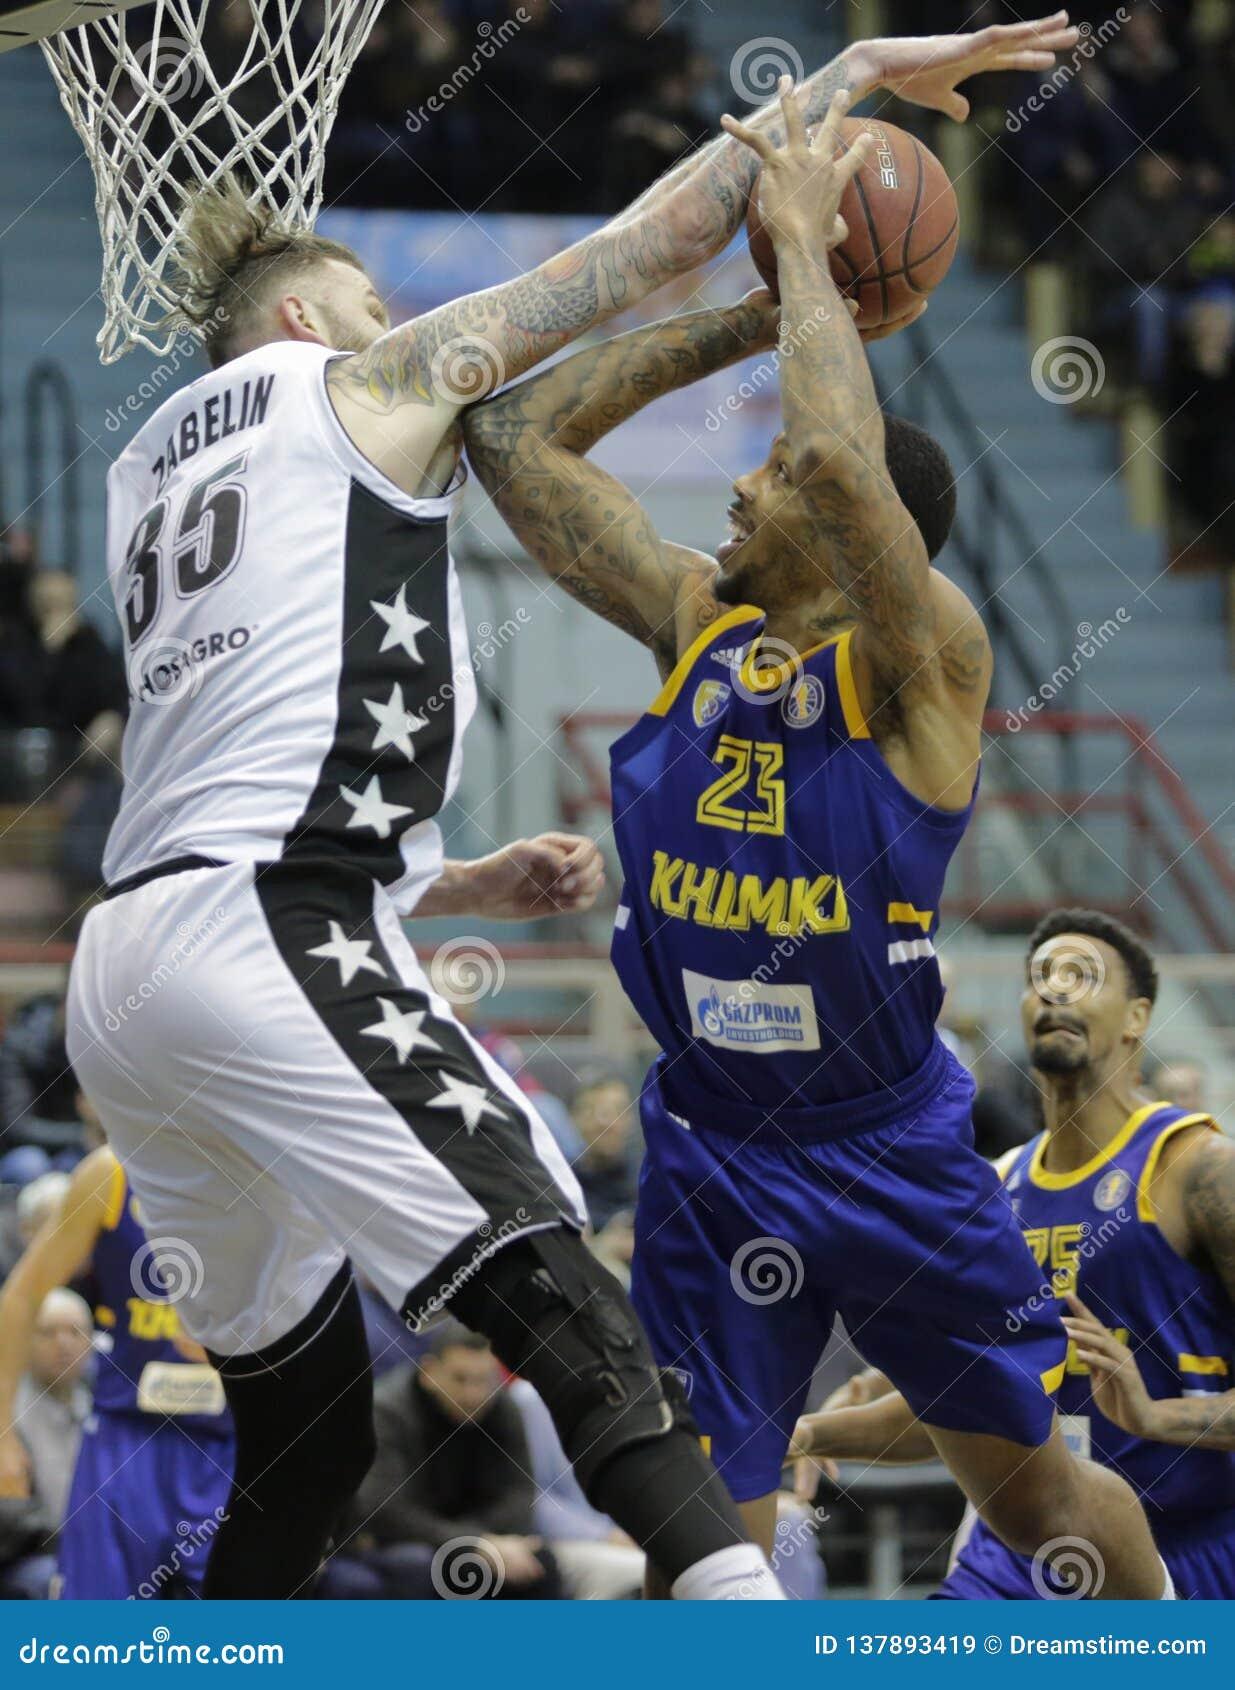 VTB League 2018-2019. Basketball. Russia.